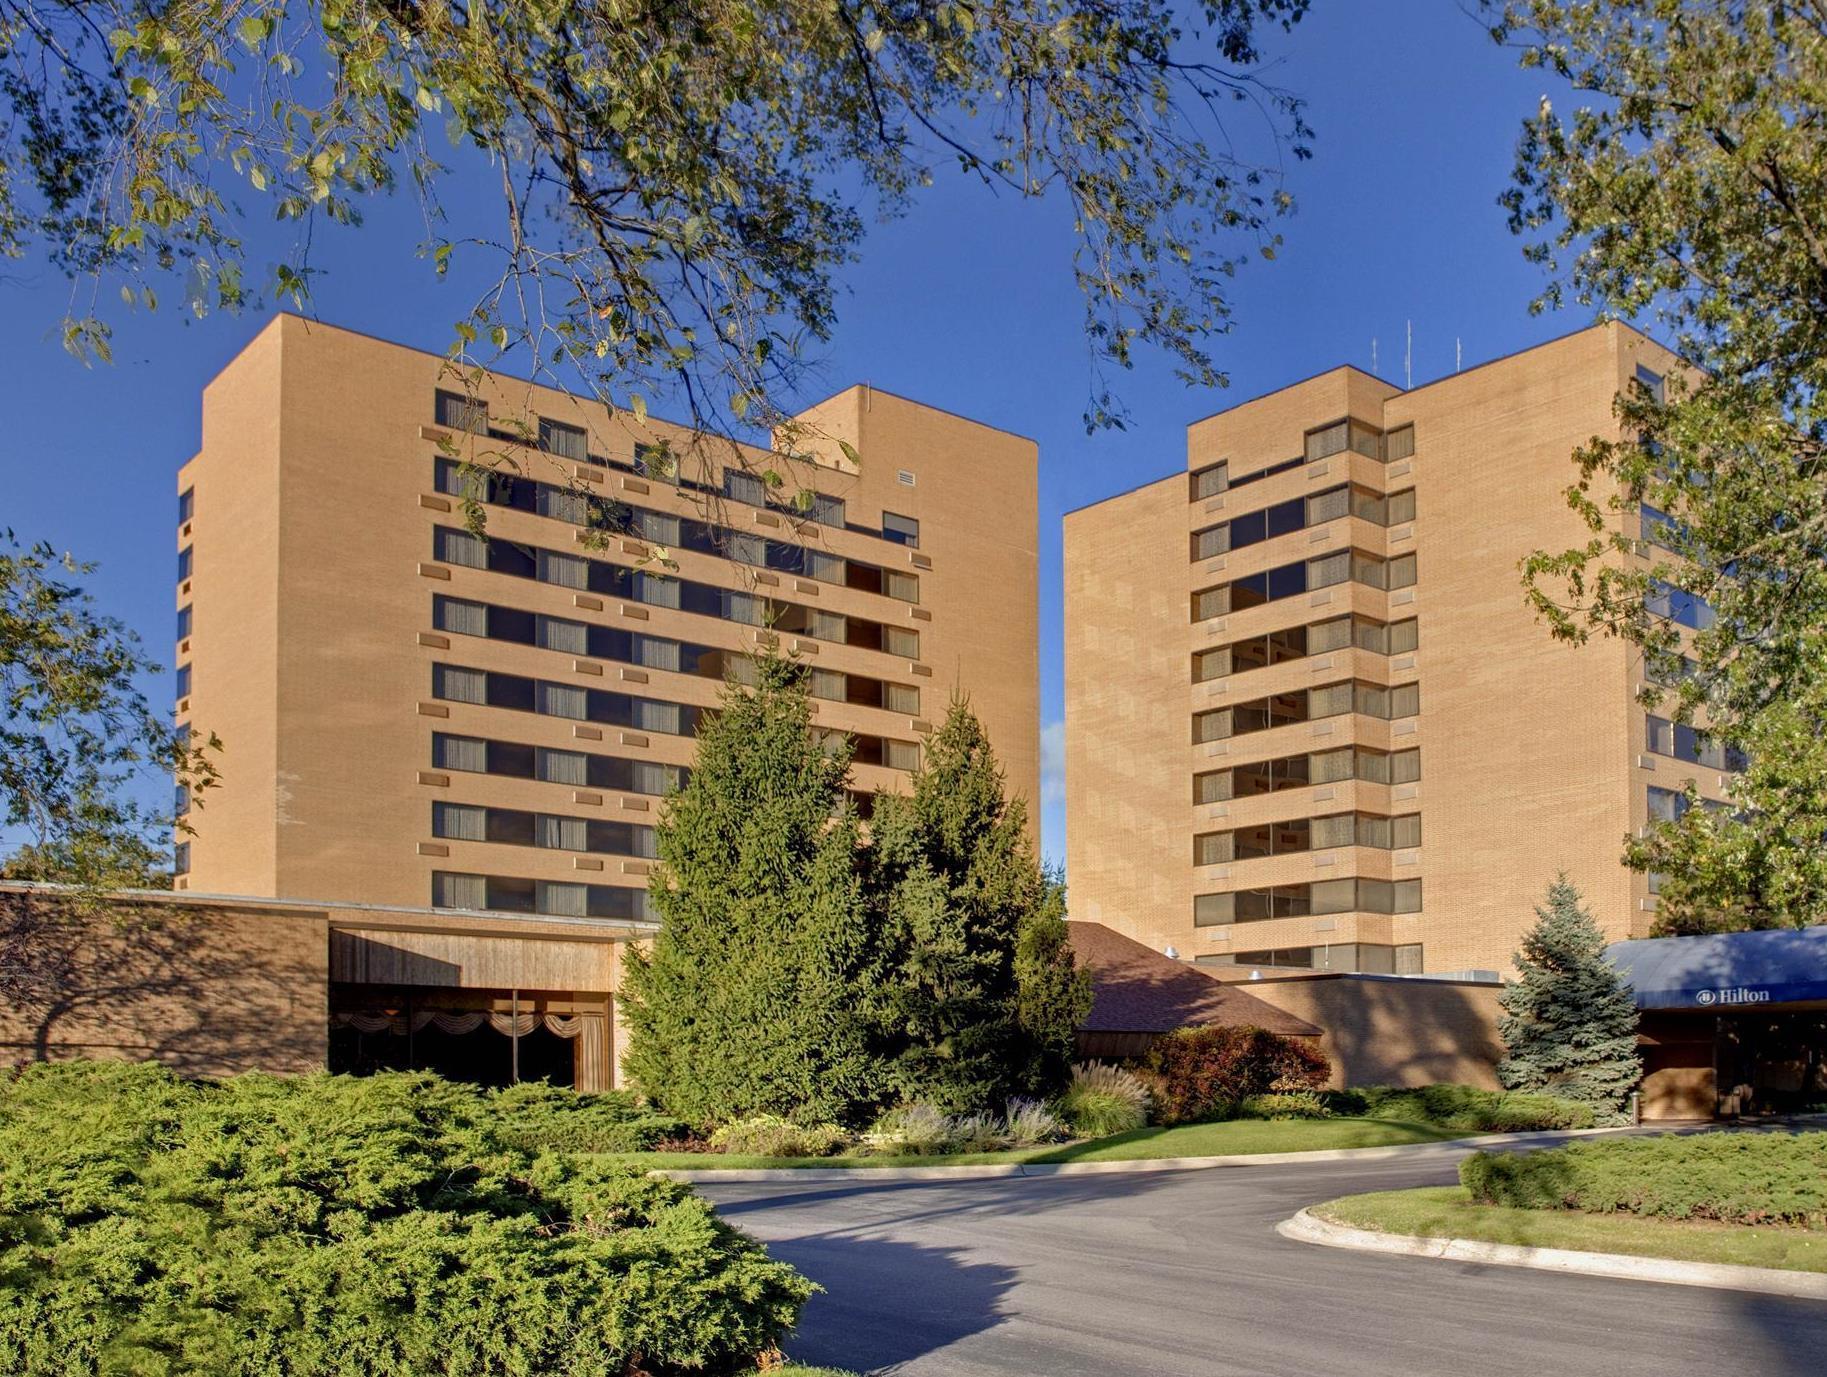 Hilton Northbrook Hotel image